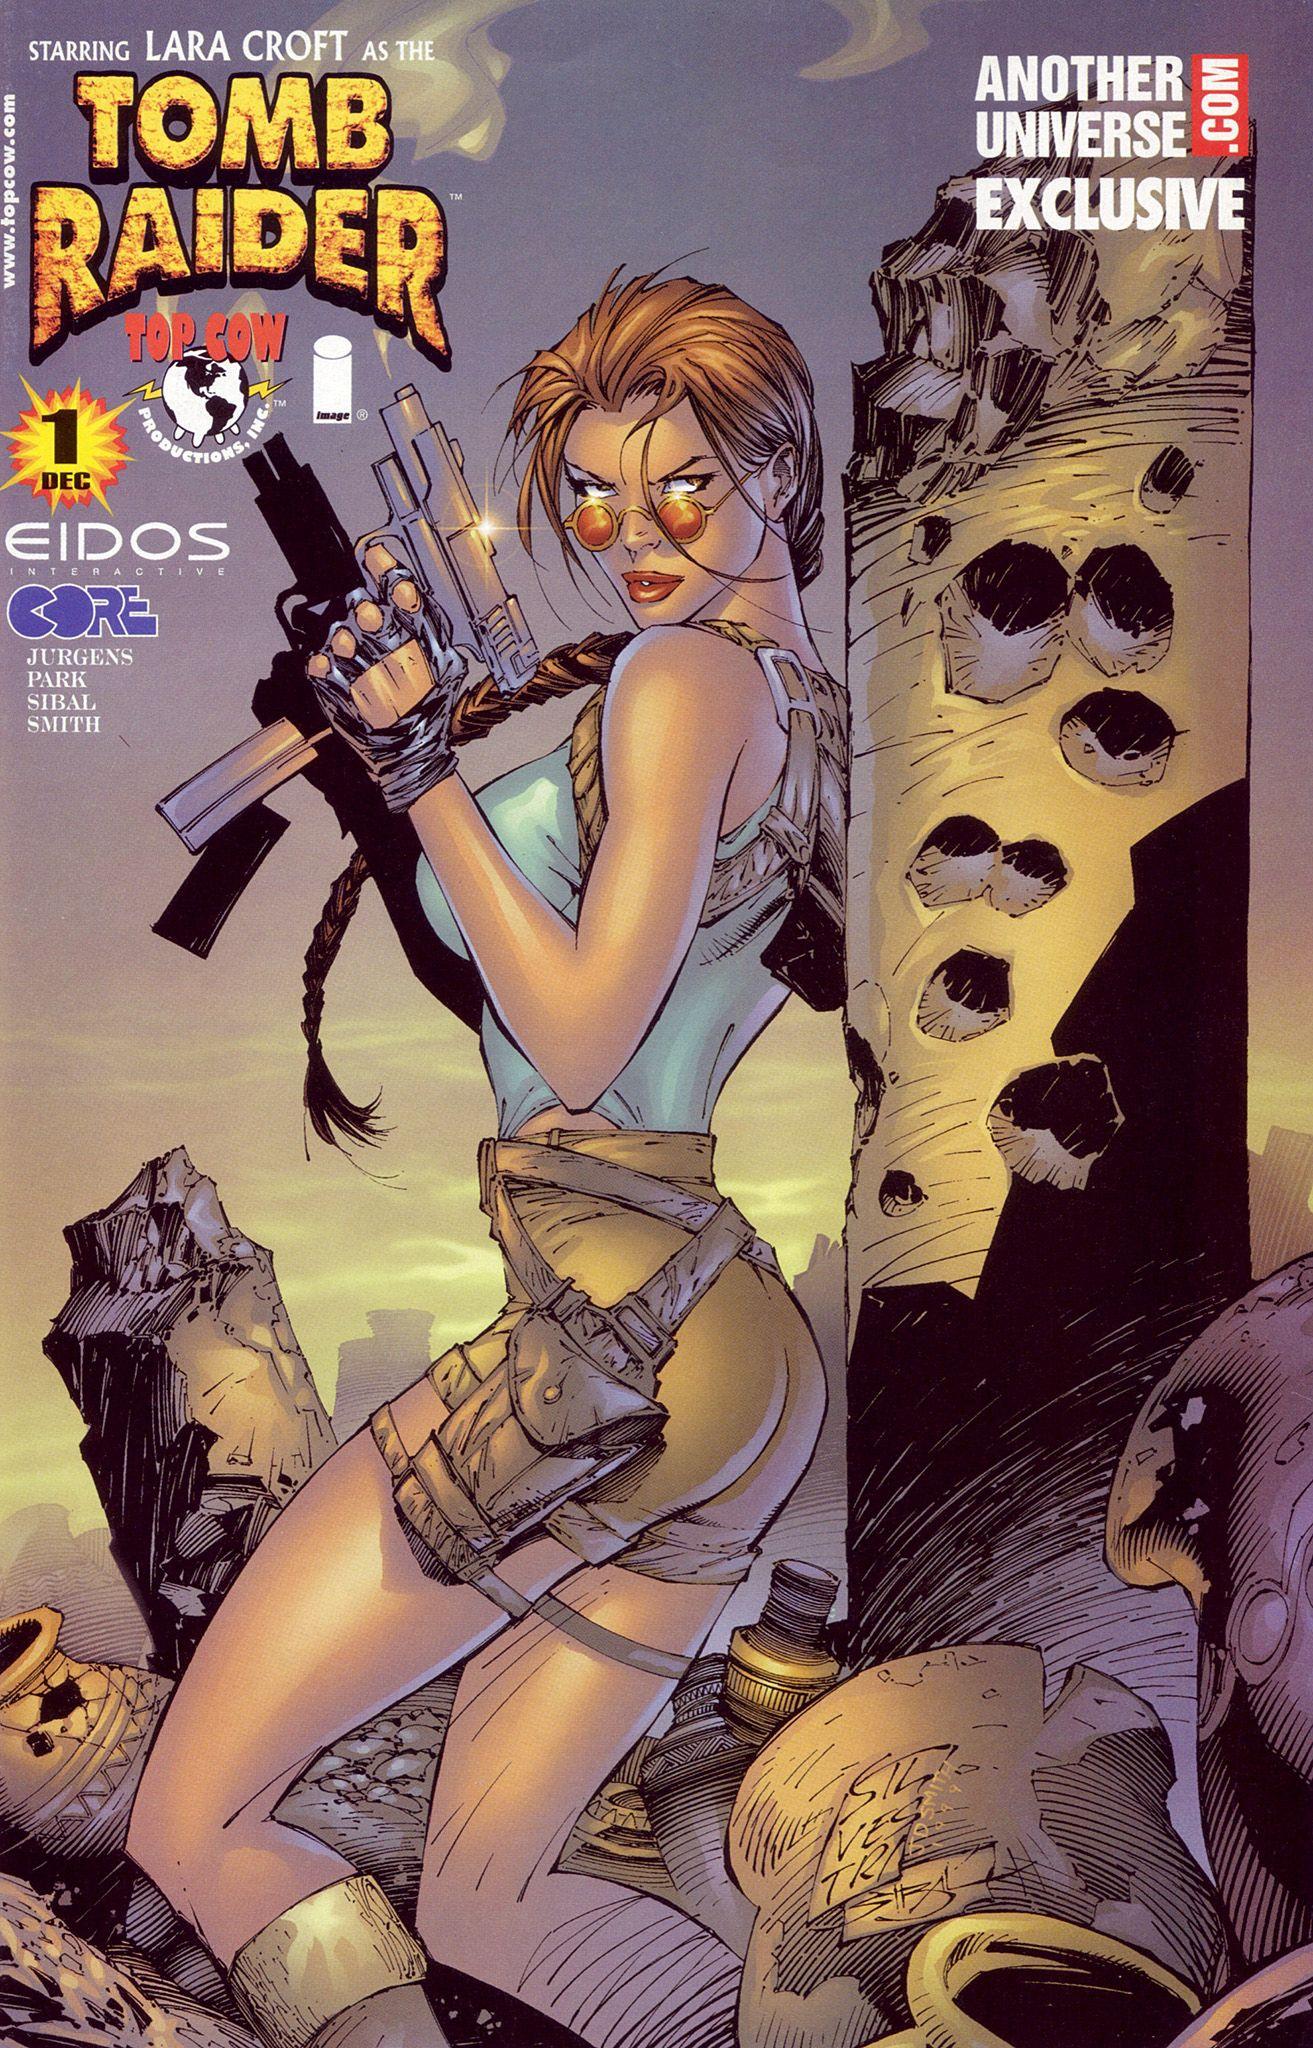 Lara Croft As The Tomb Raider 1 By Marc Silvestri Female Comic